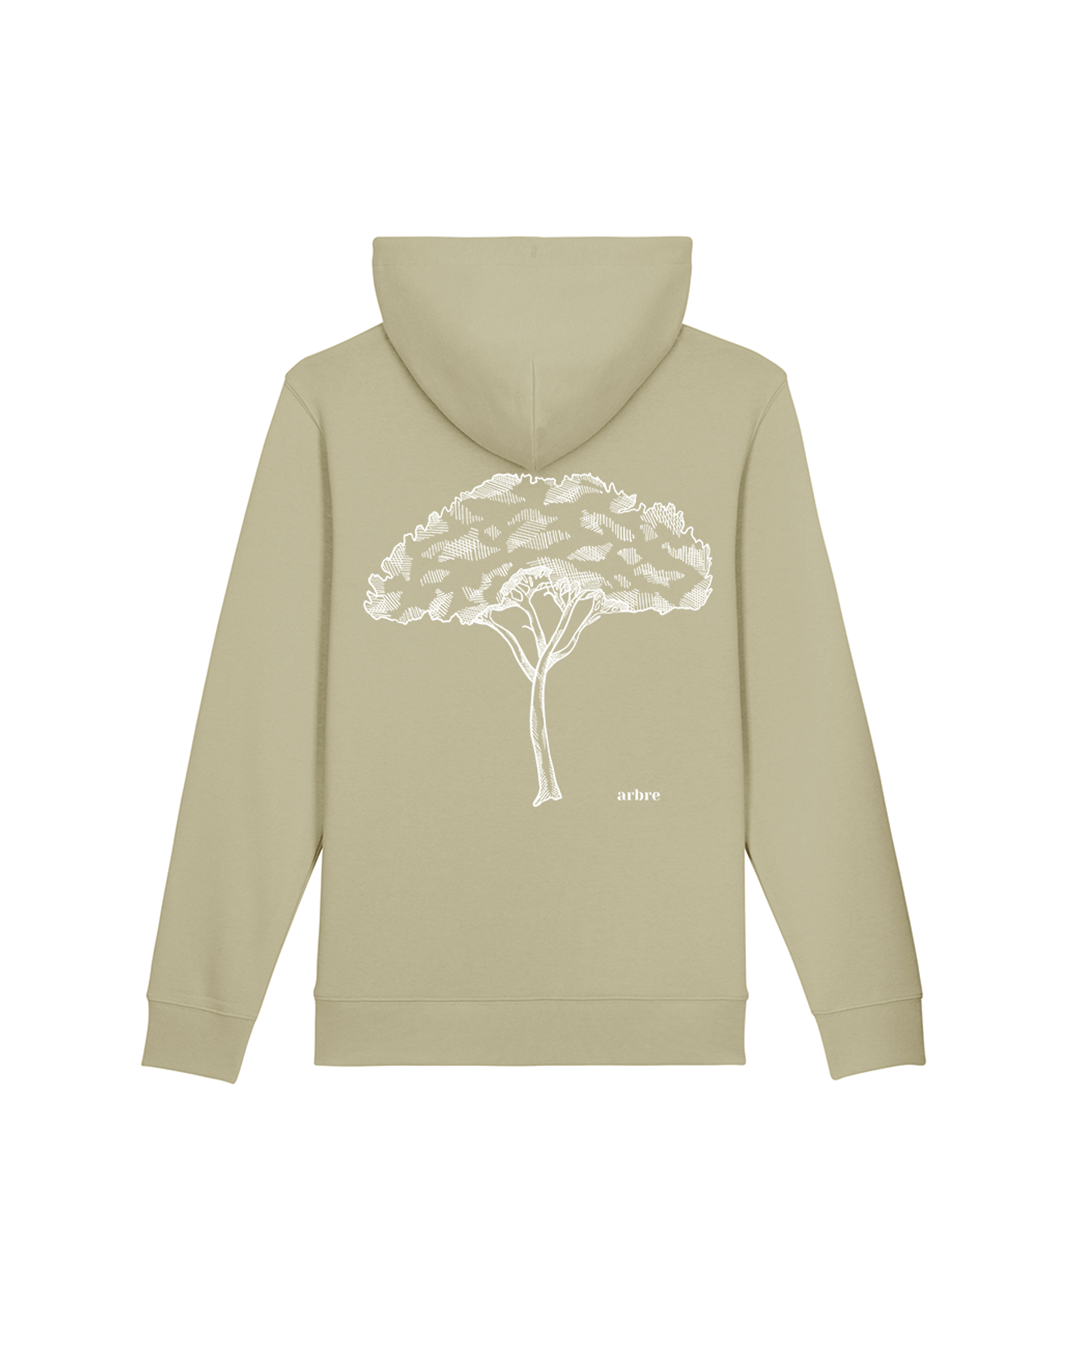 Arbre - Sweatshirt